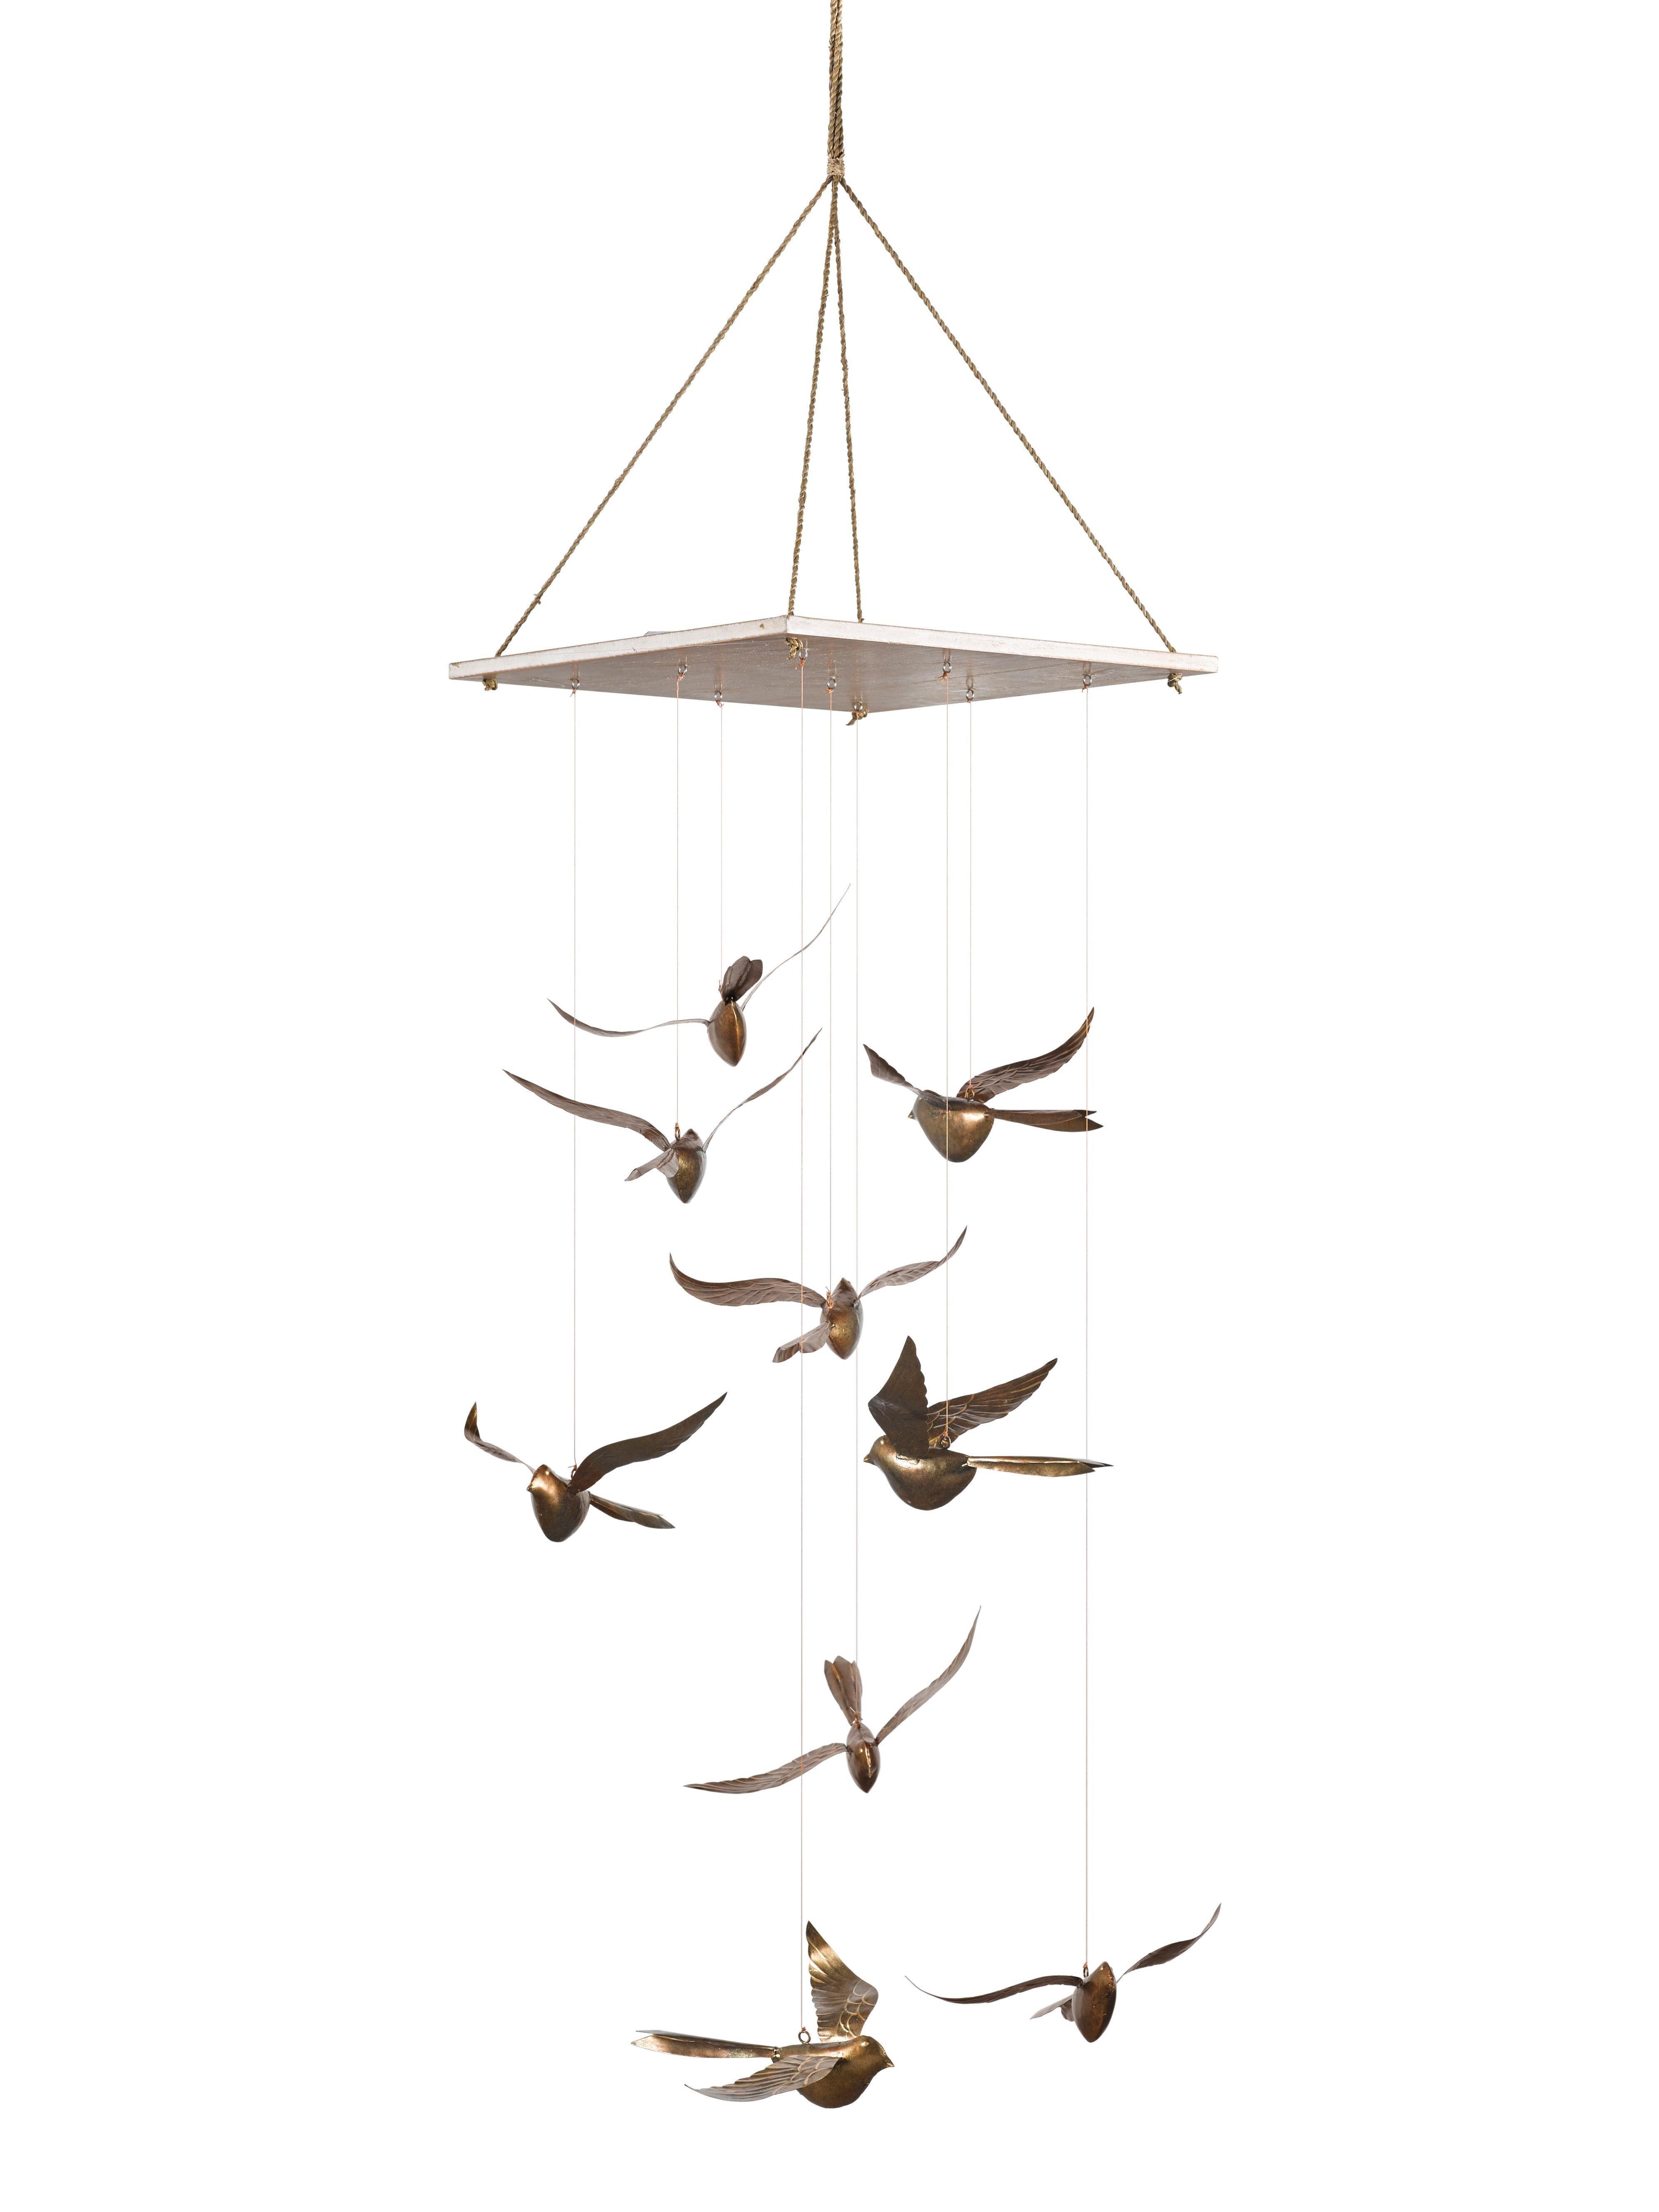 heine home Hängedeko Vögel